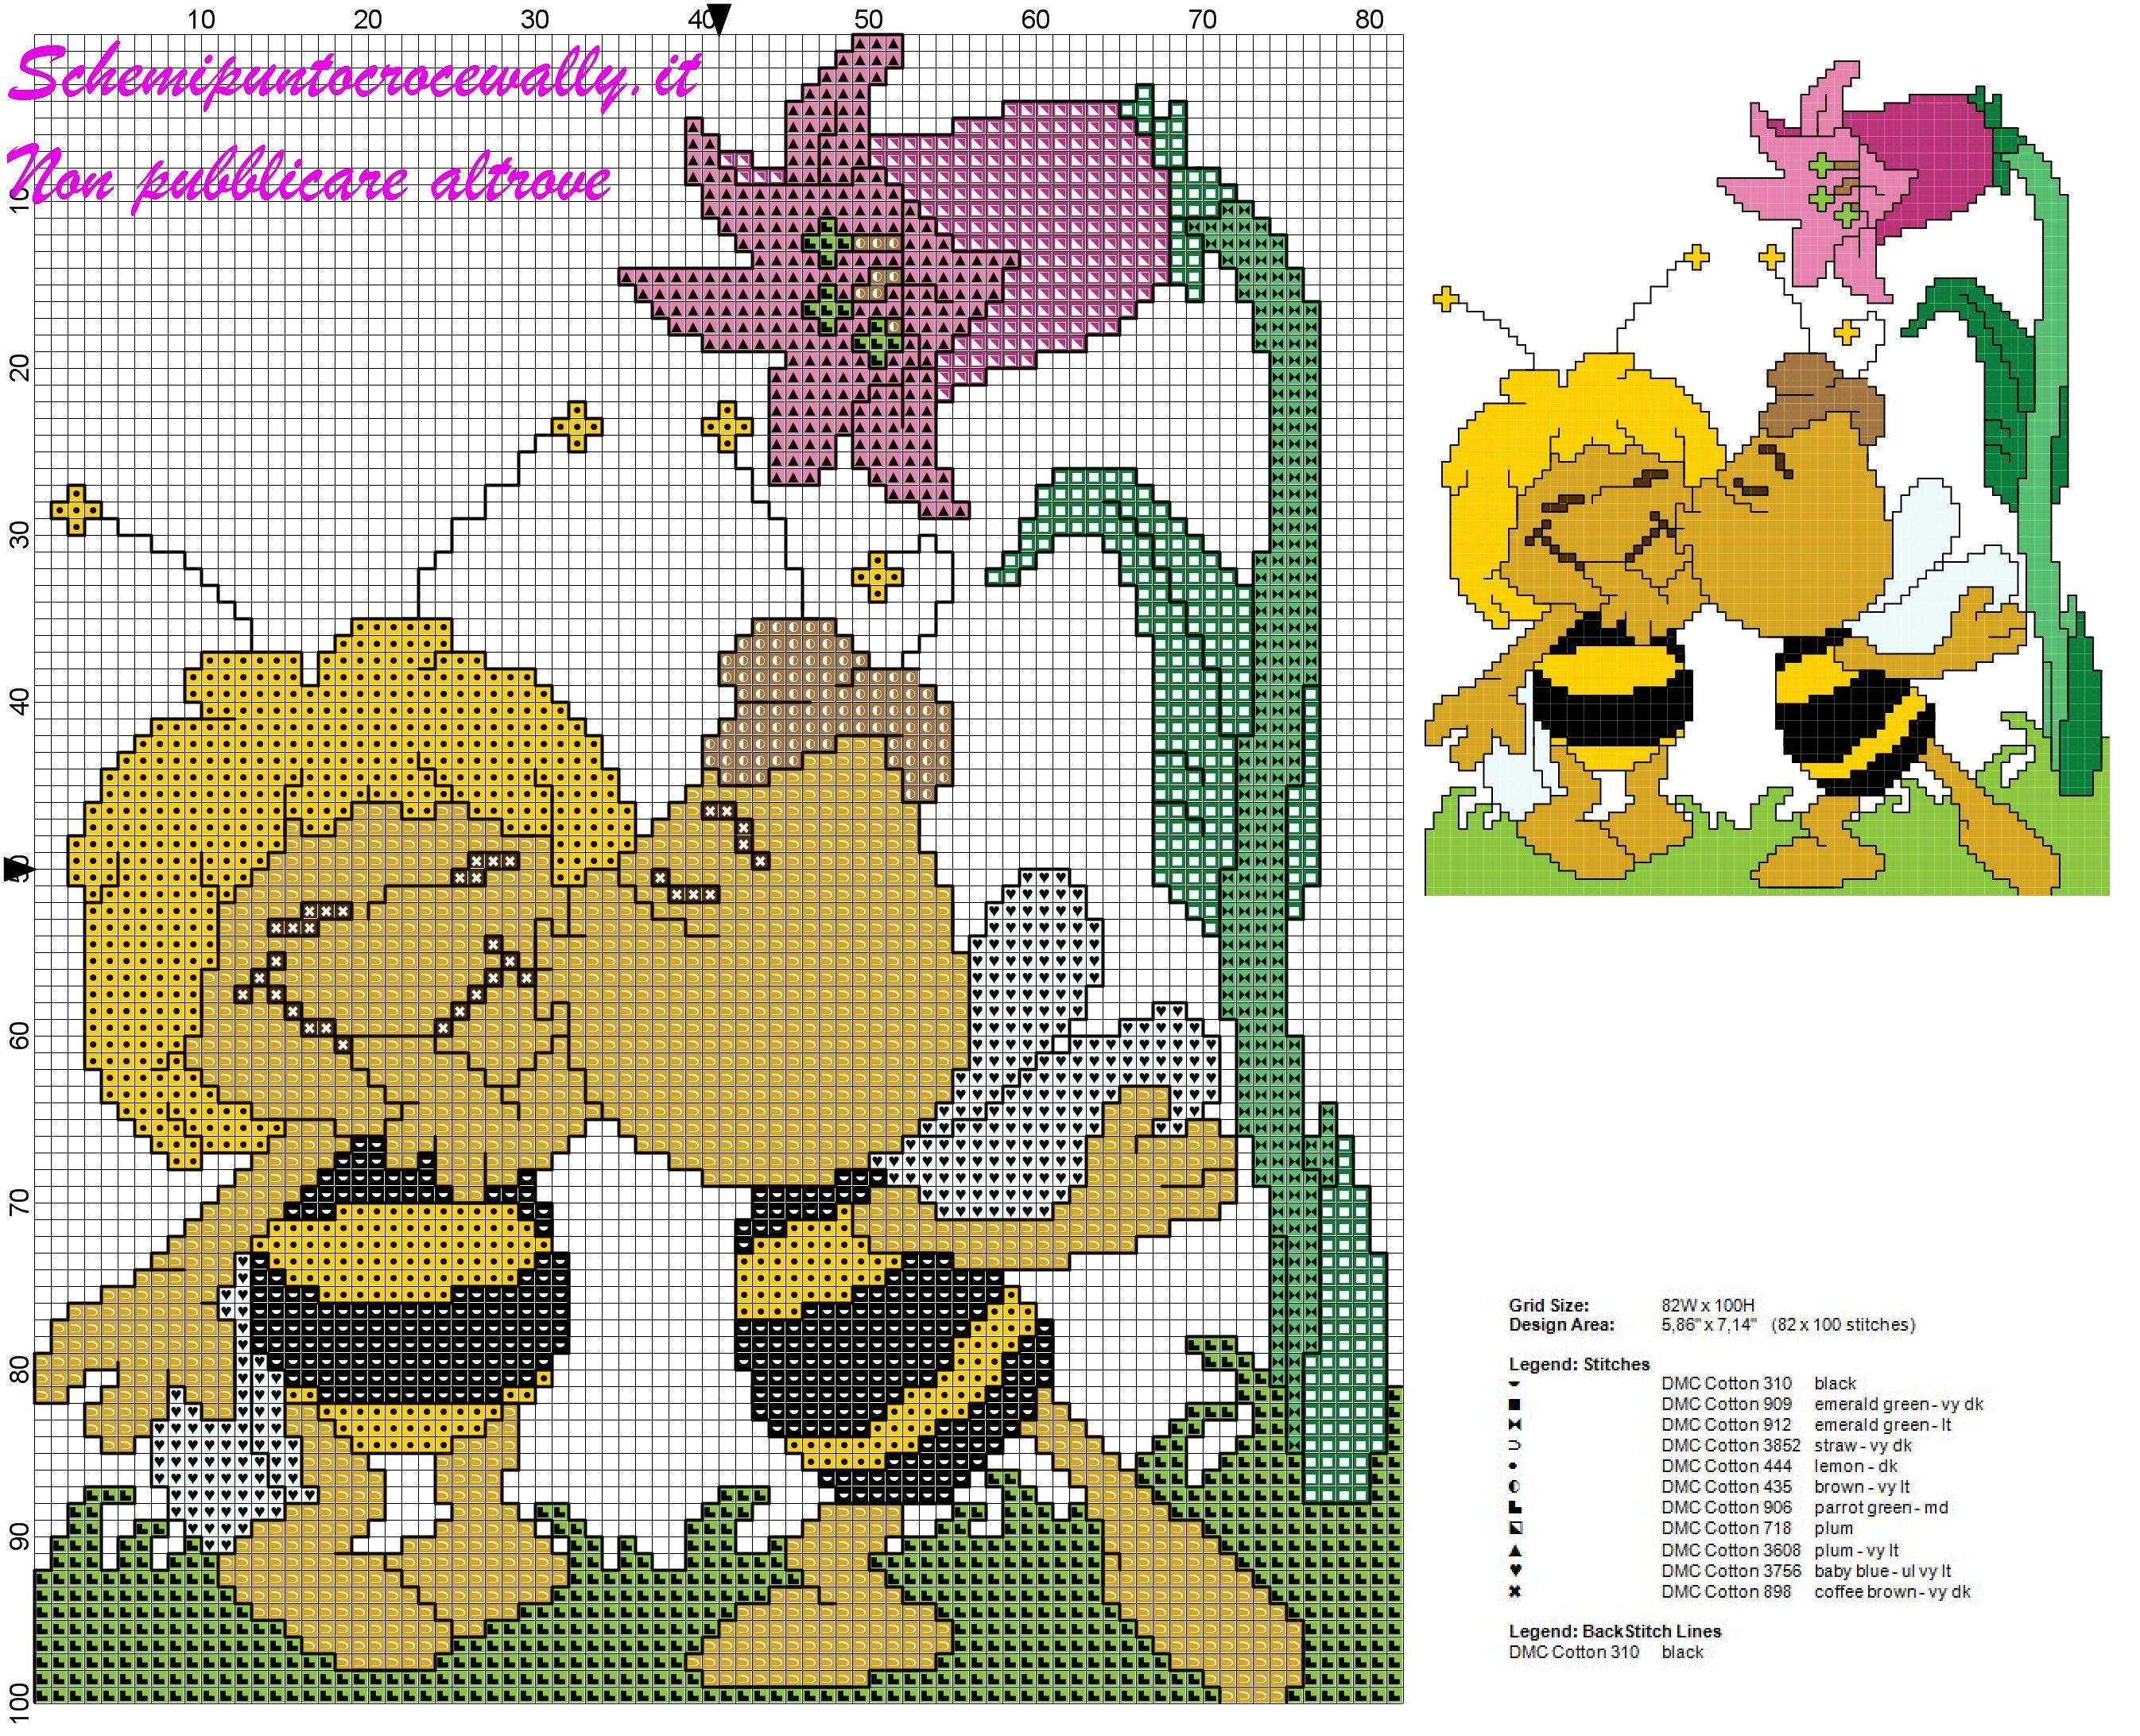 Schema punto croce per bambini willy da un bacino ad ape for Punto croce bambini disney